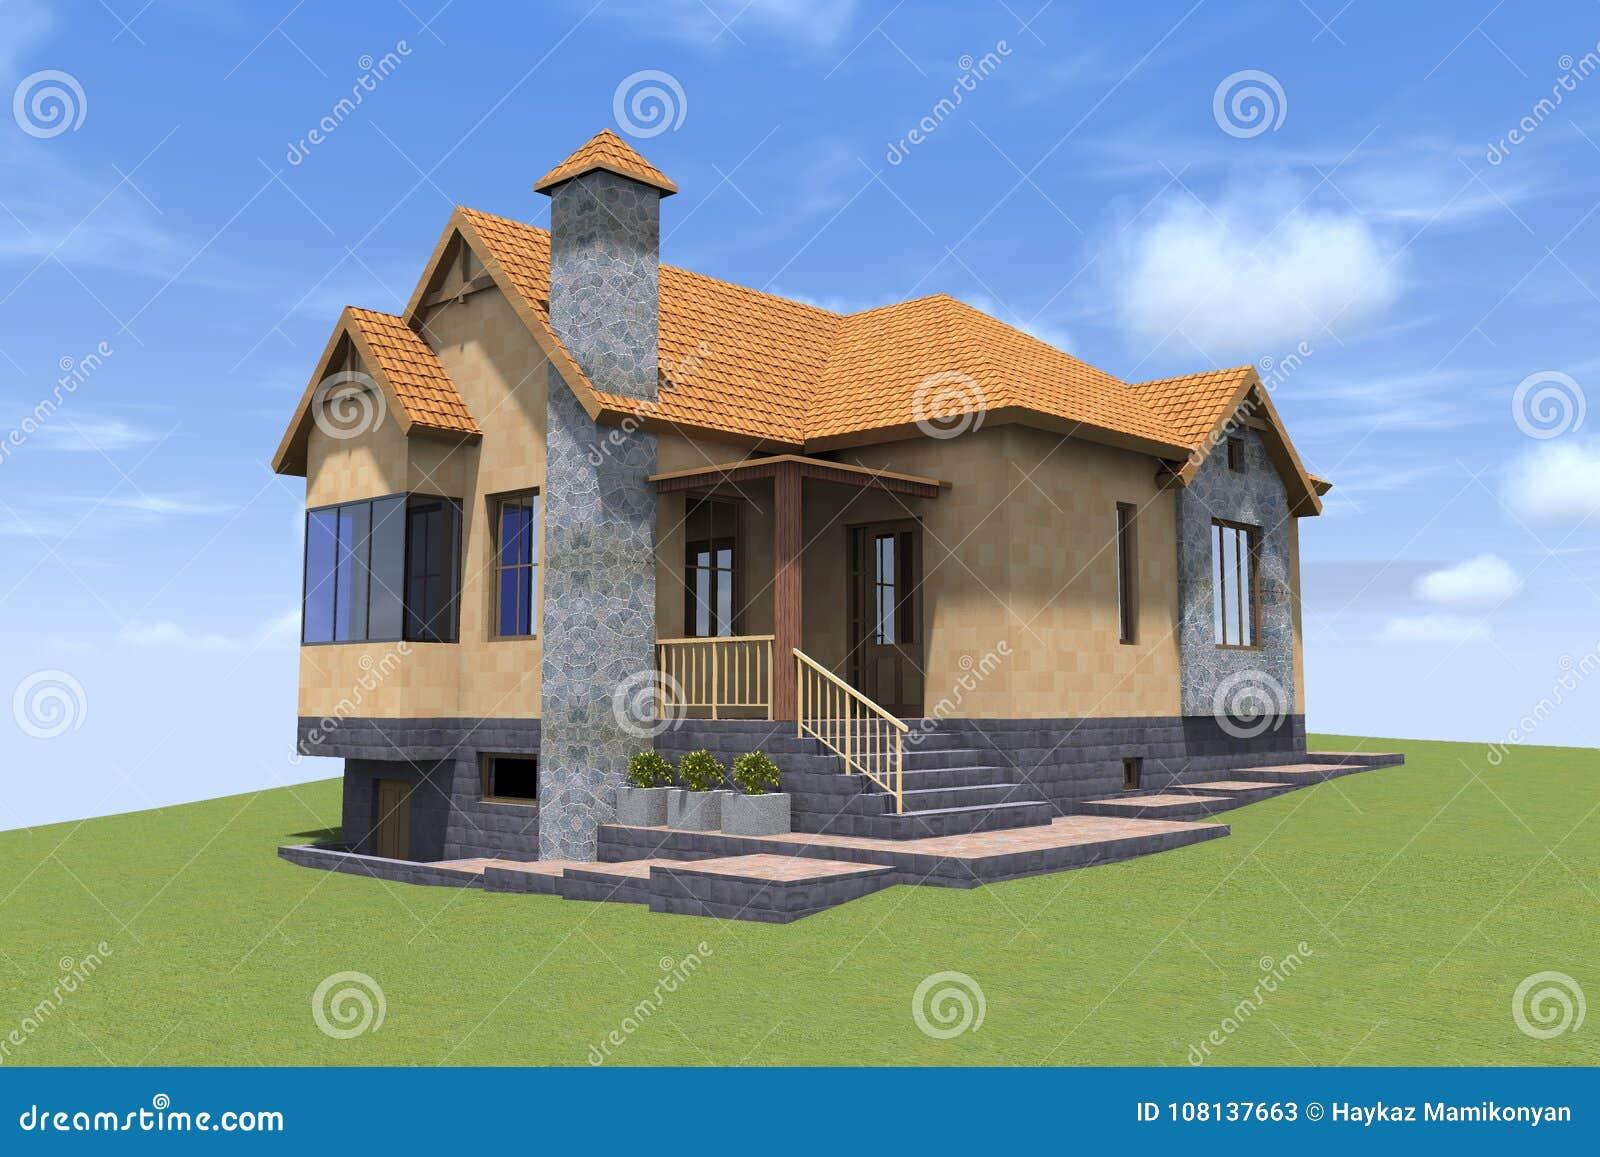 Download 3D House Render In Armenia Stock Illustration. Illustration Of  Line   108137663